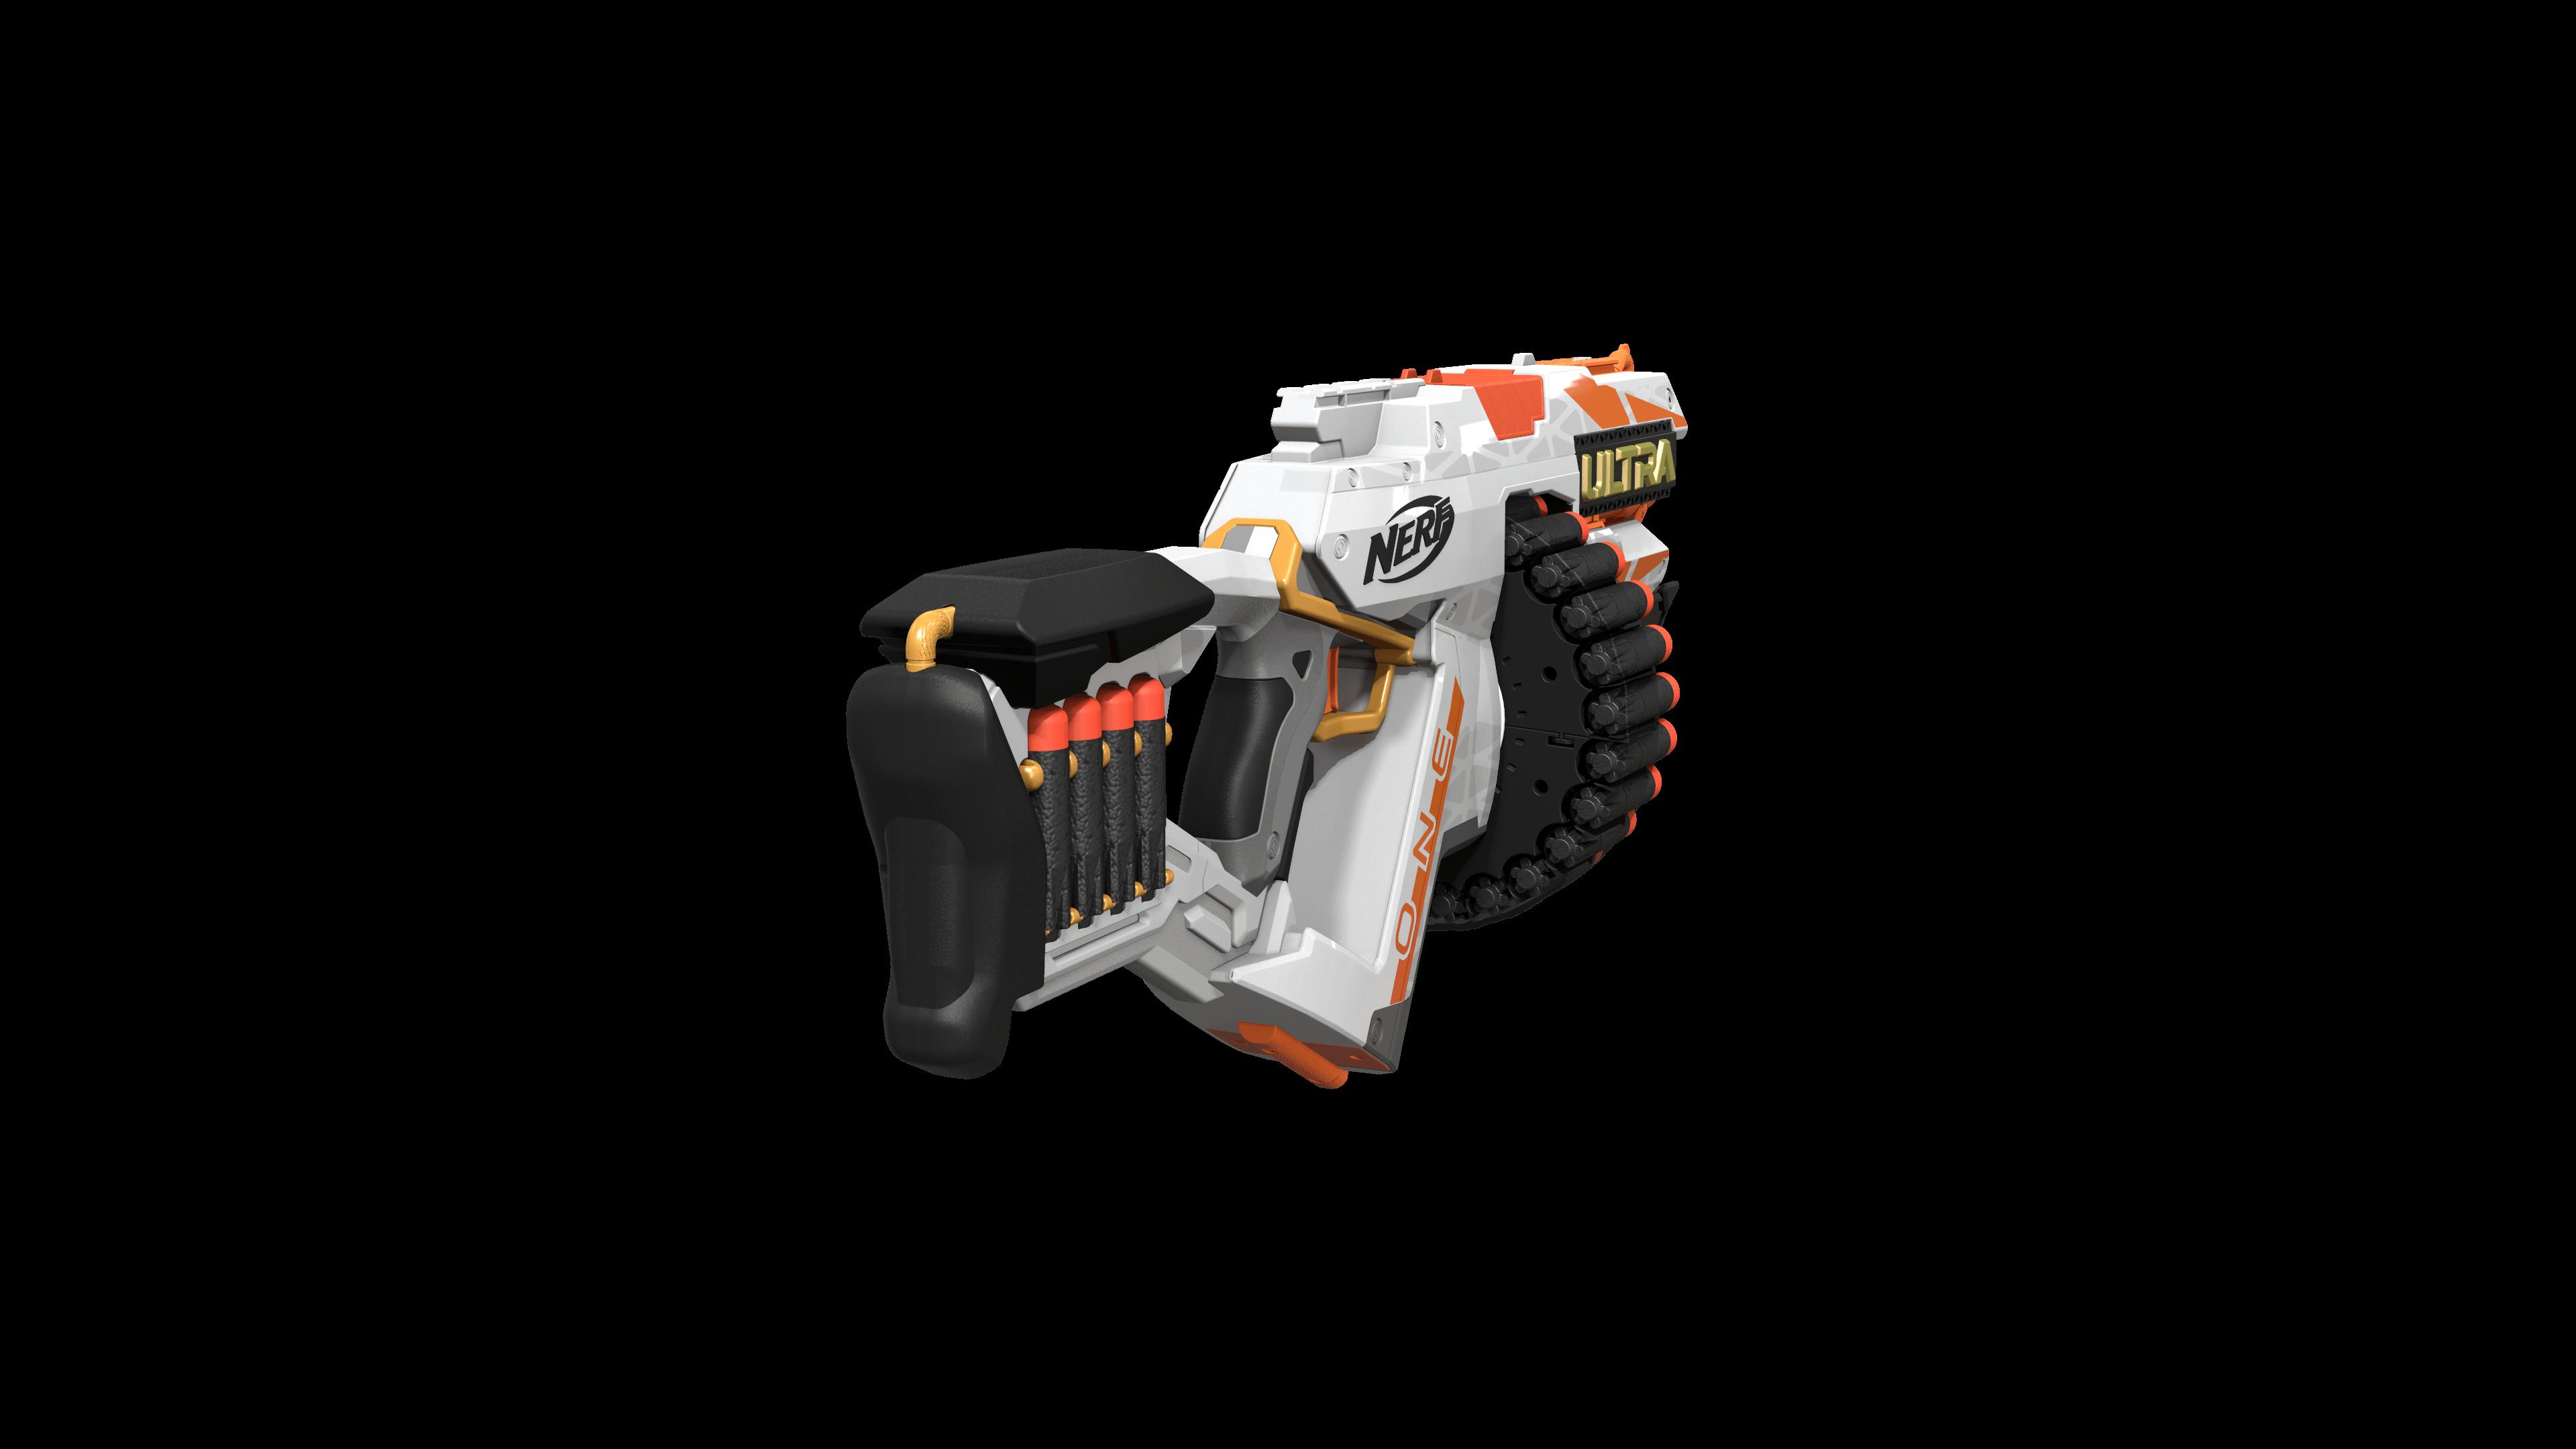 ultra blaster img 23